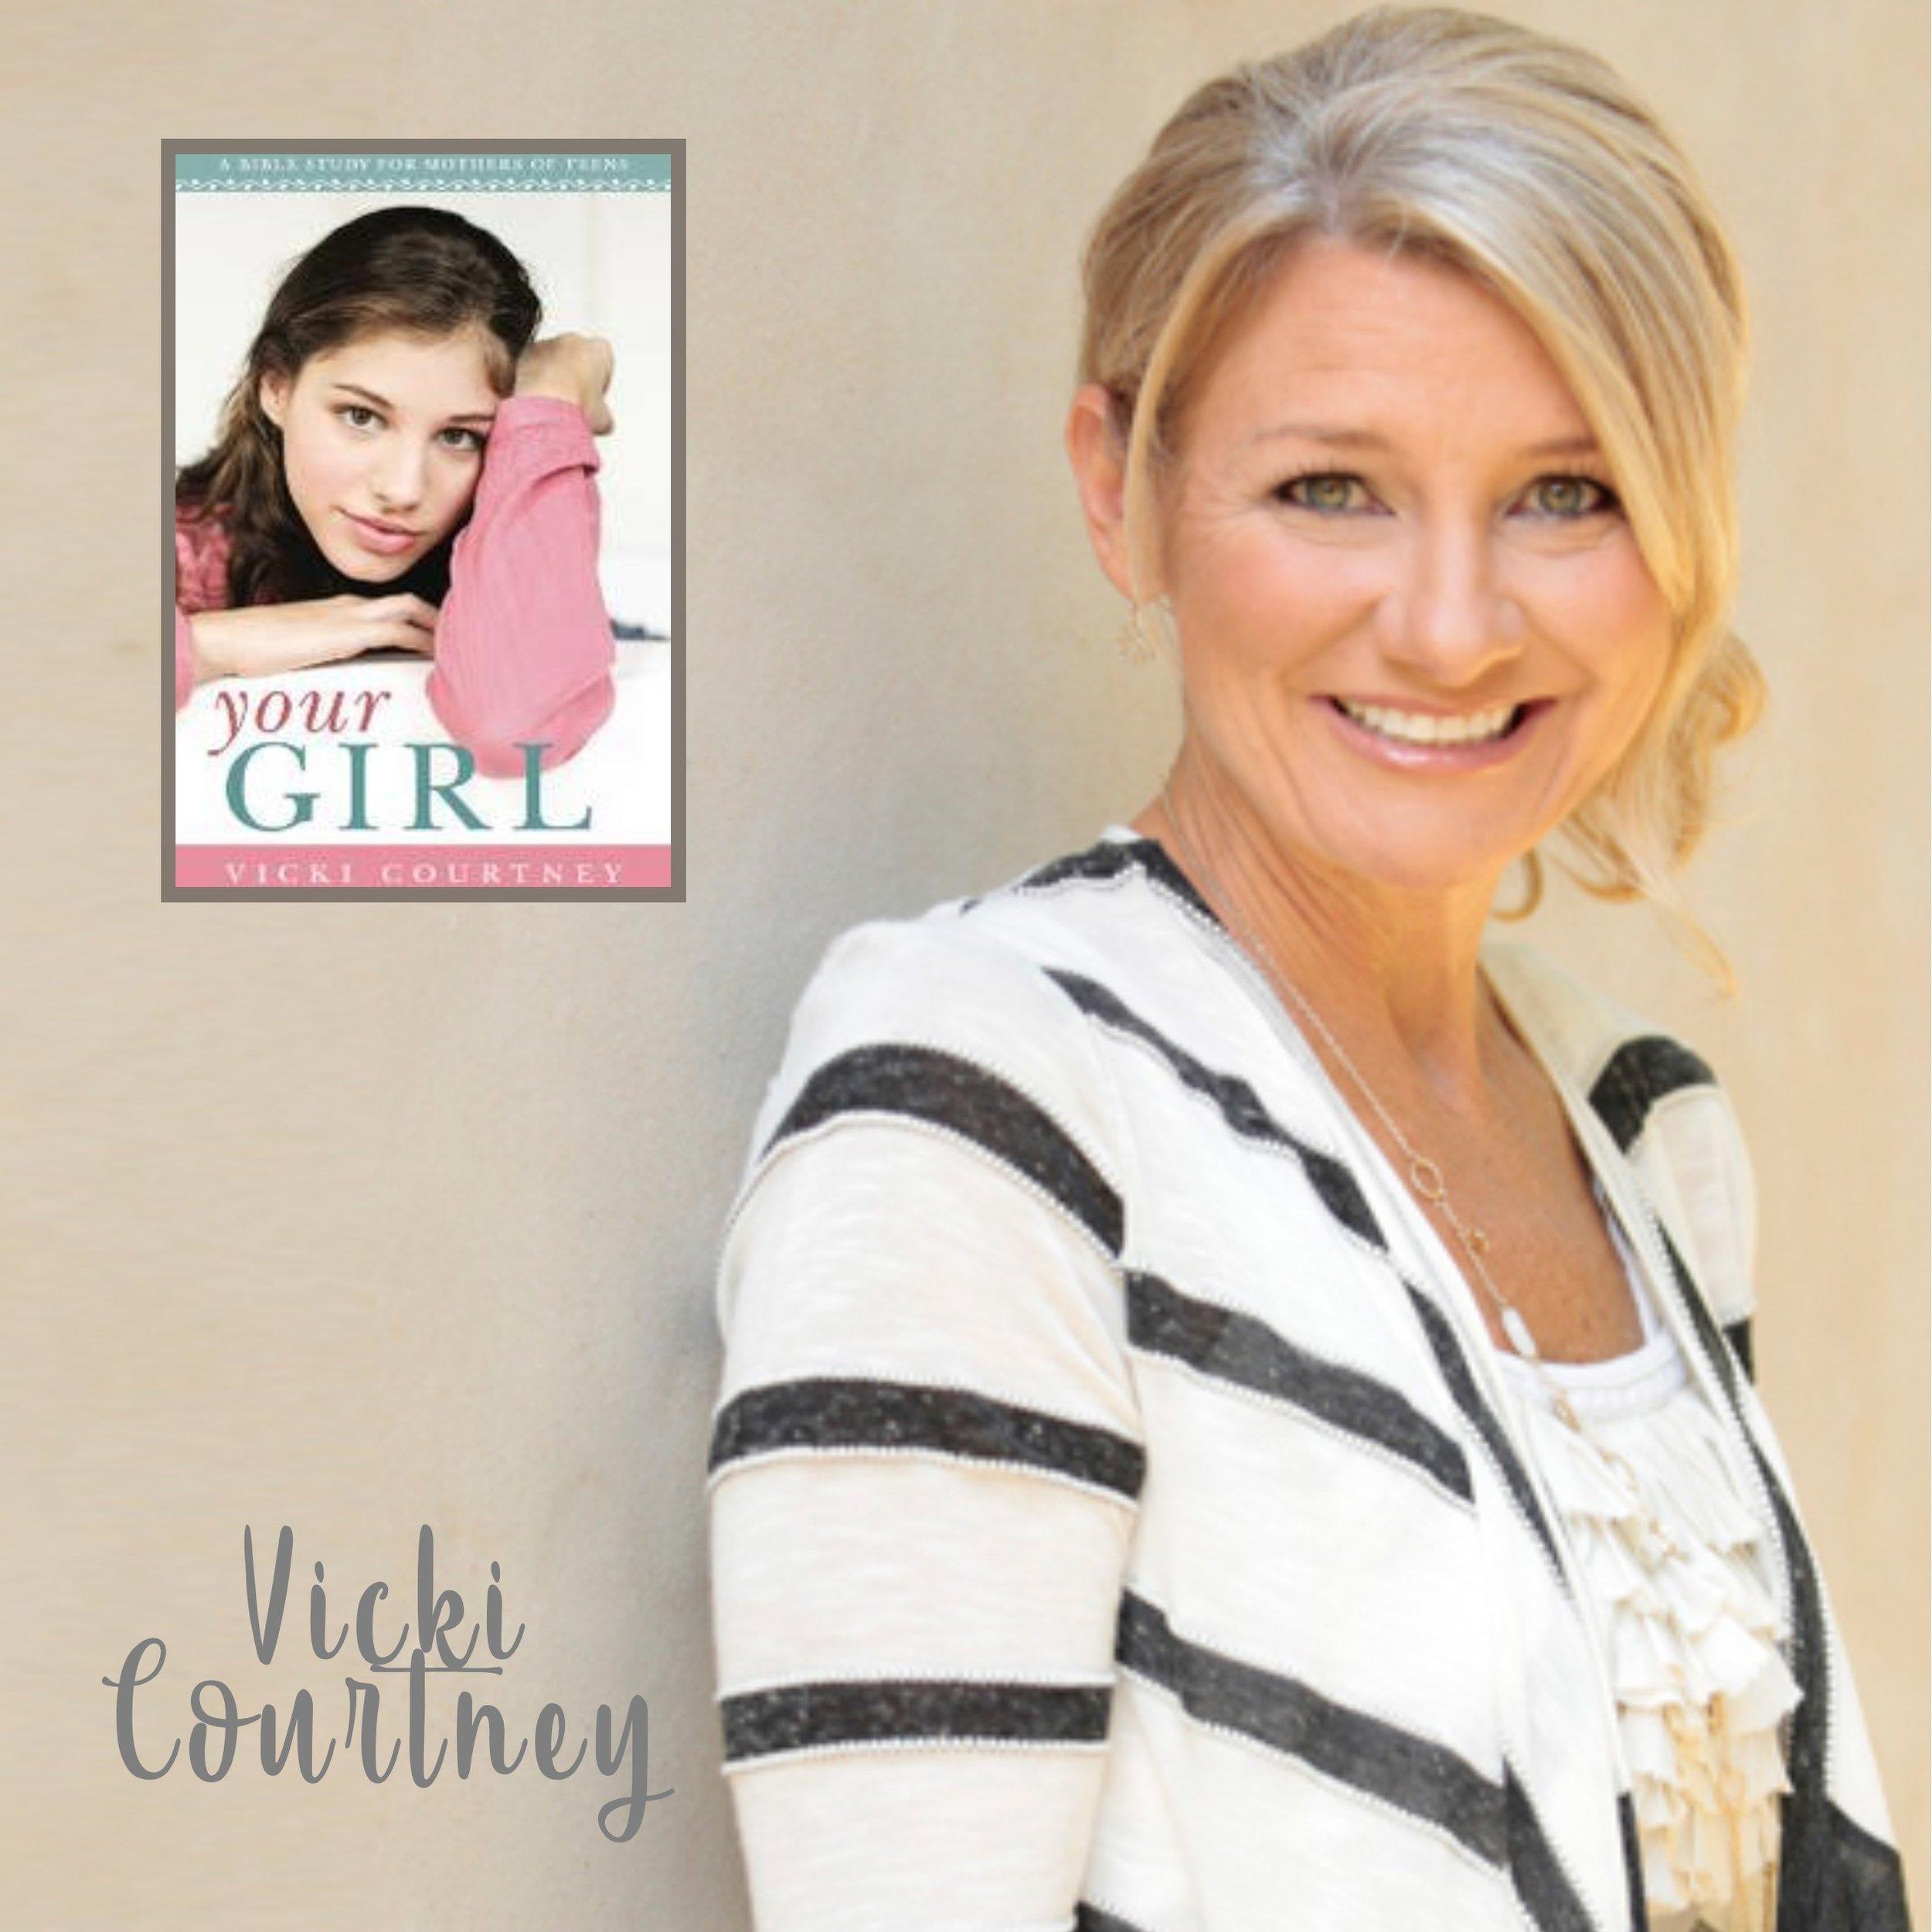 Photo from  vickicourtney.com